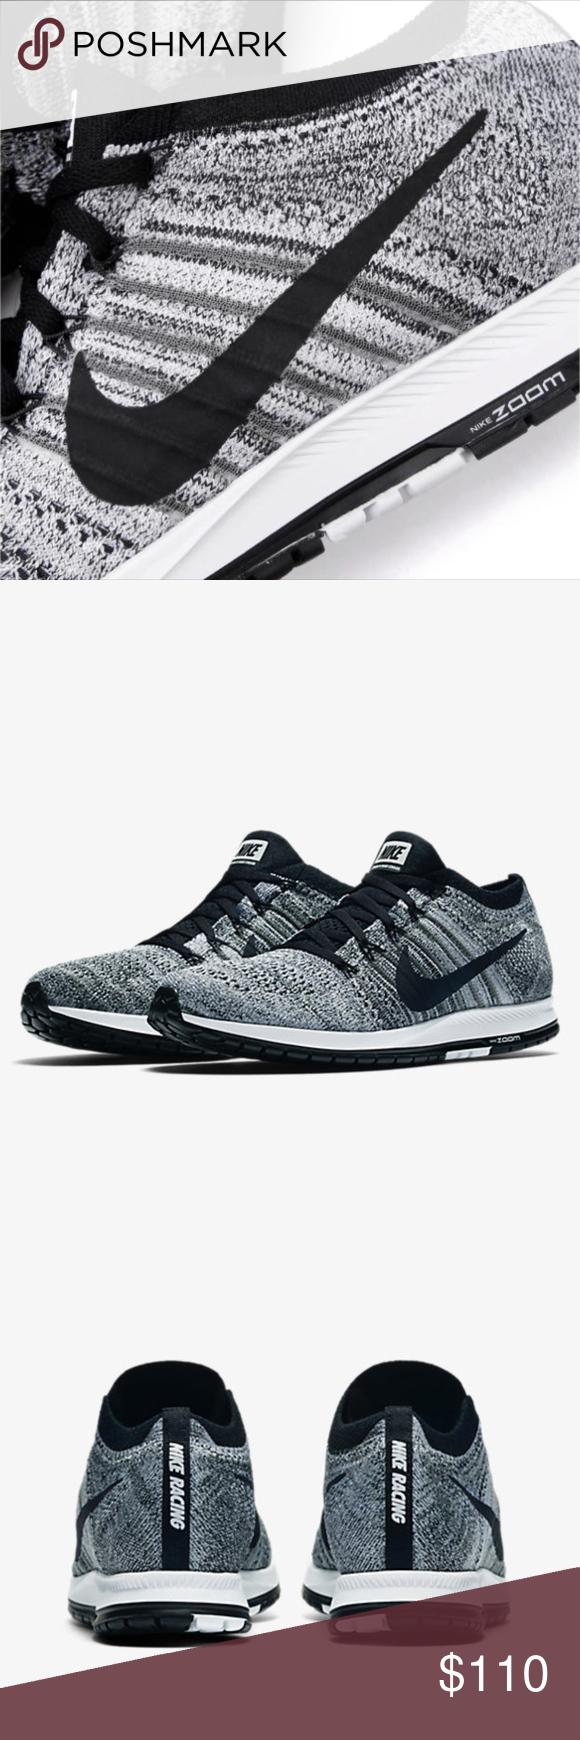 Nike Zoom Flyknit Streak Running Shoes NWT Nike zoom